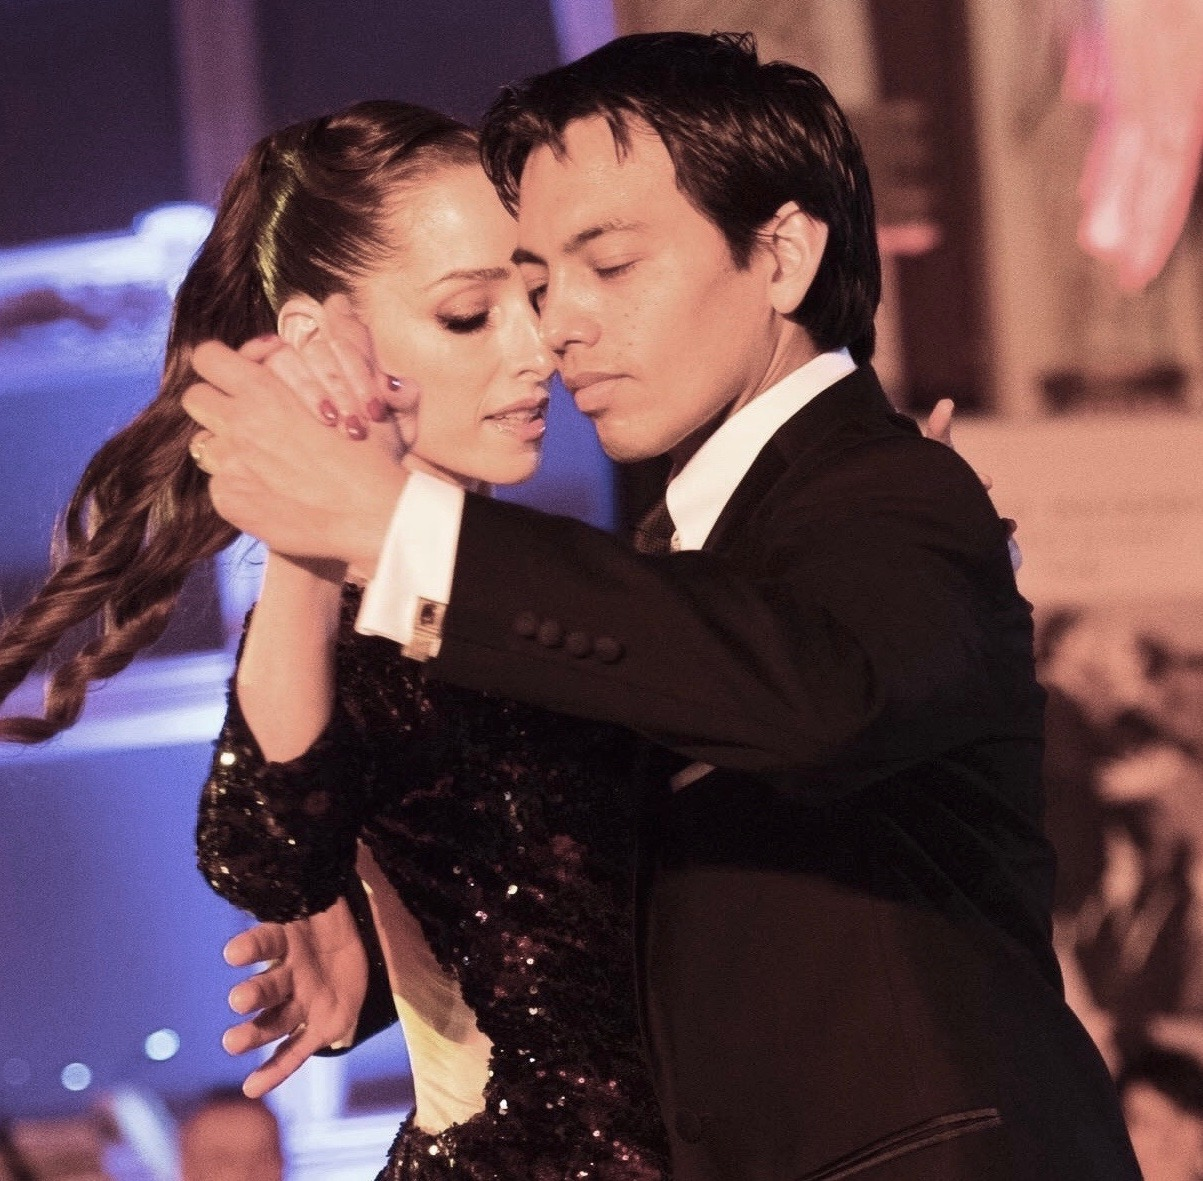 tango teachers David & Kim dancing together